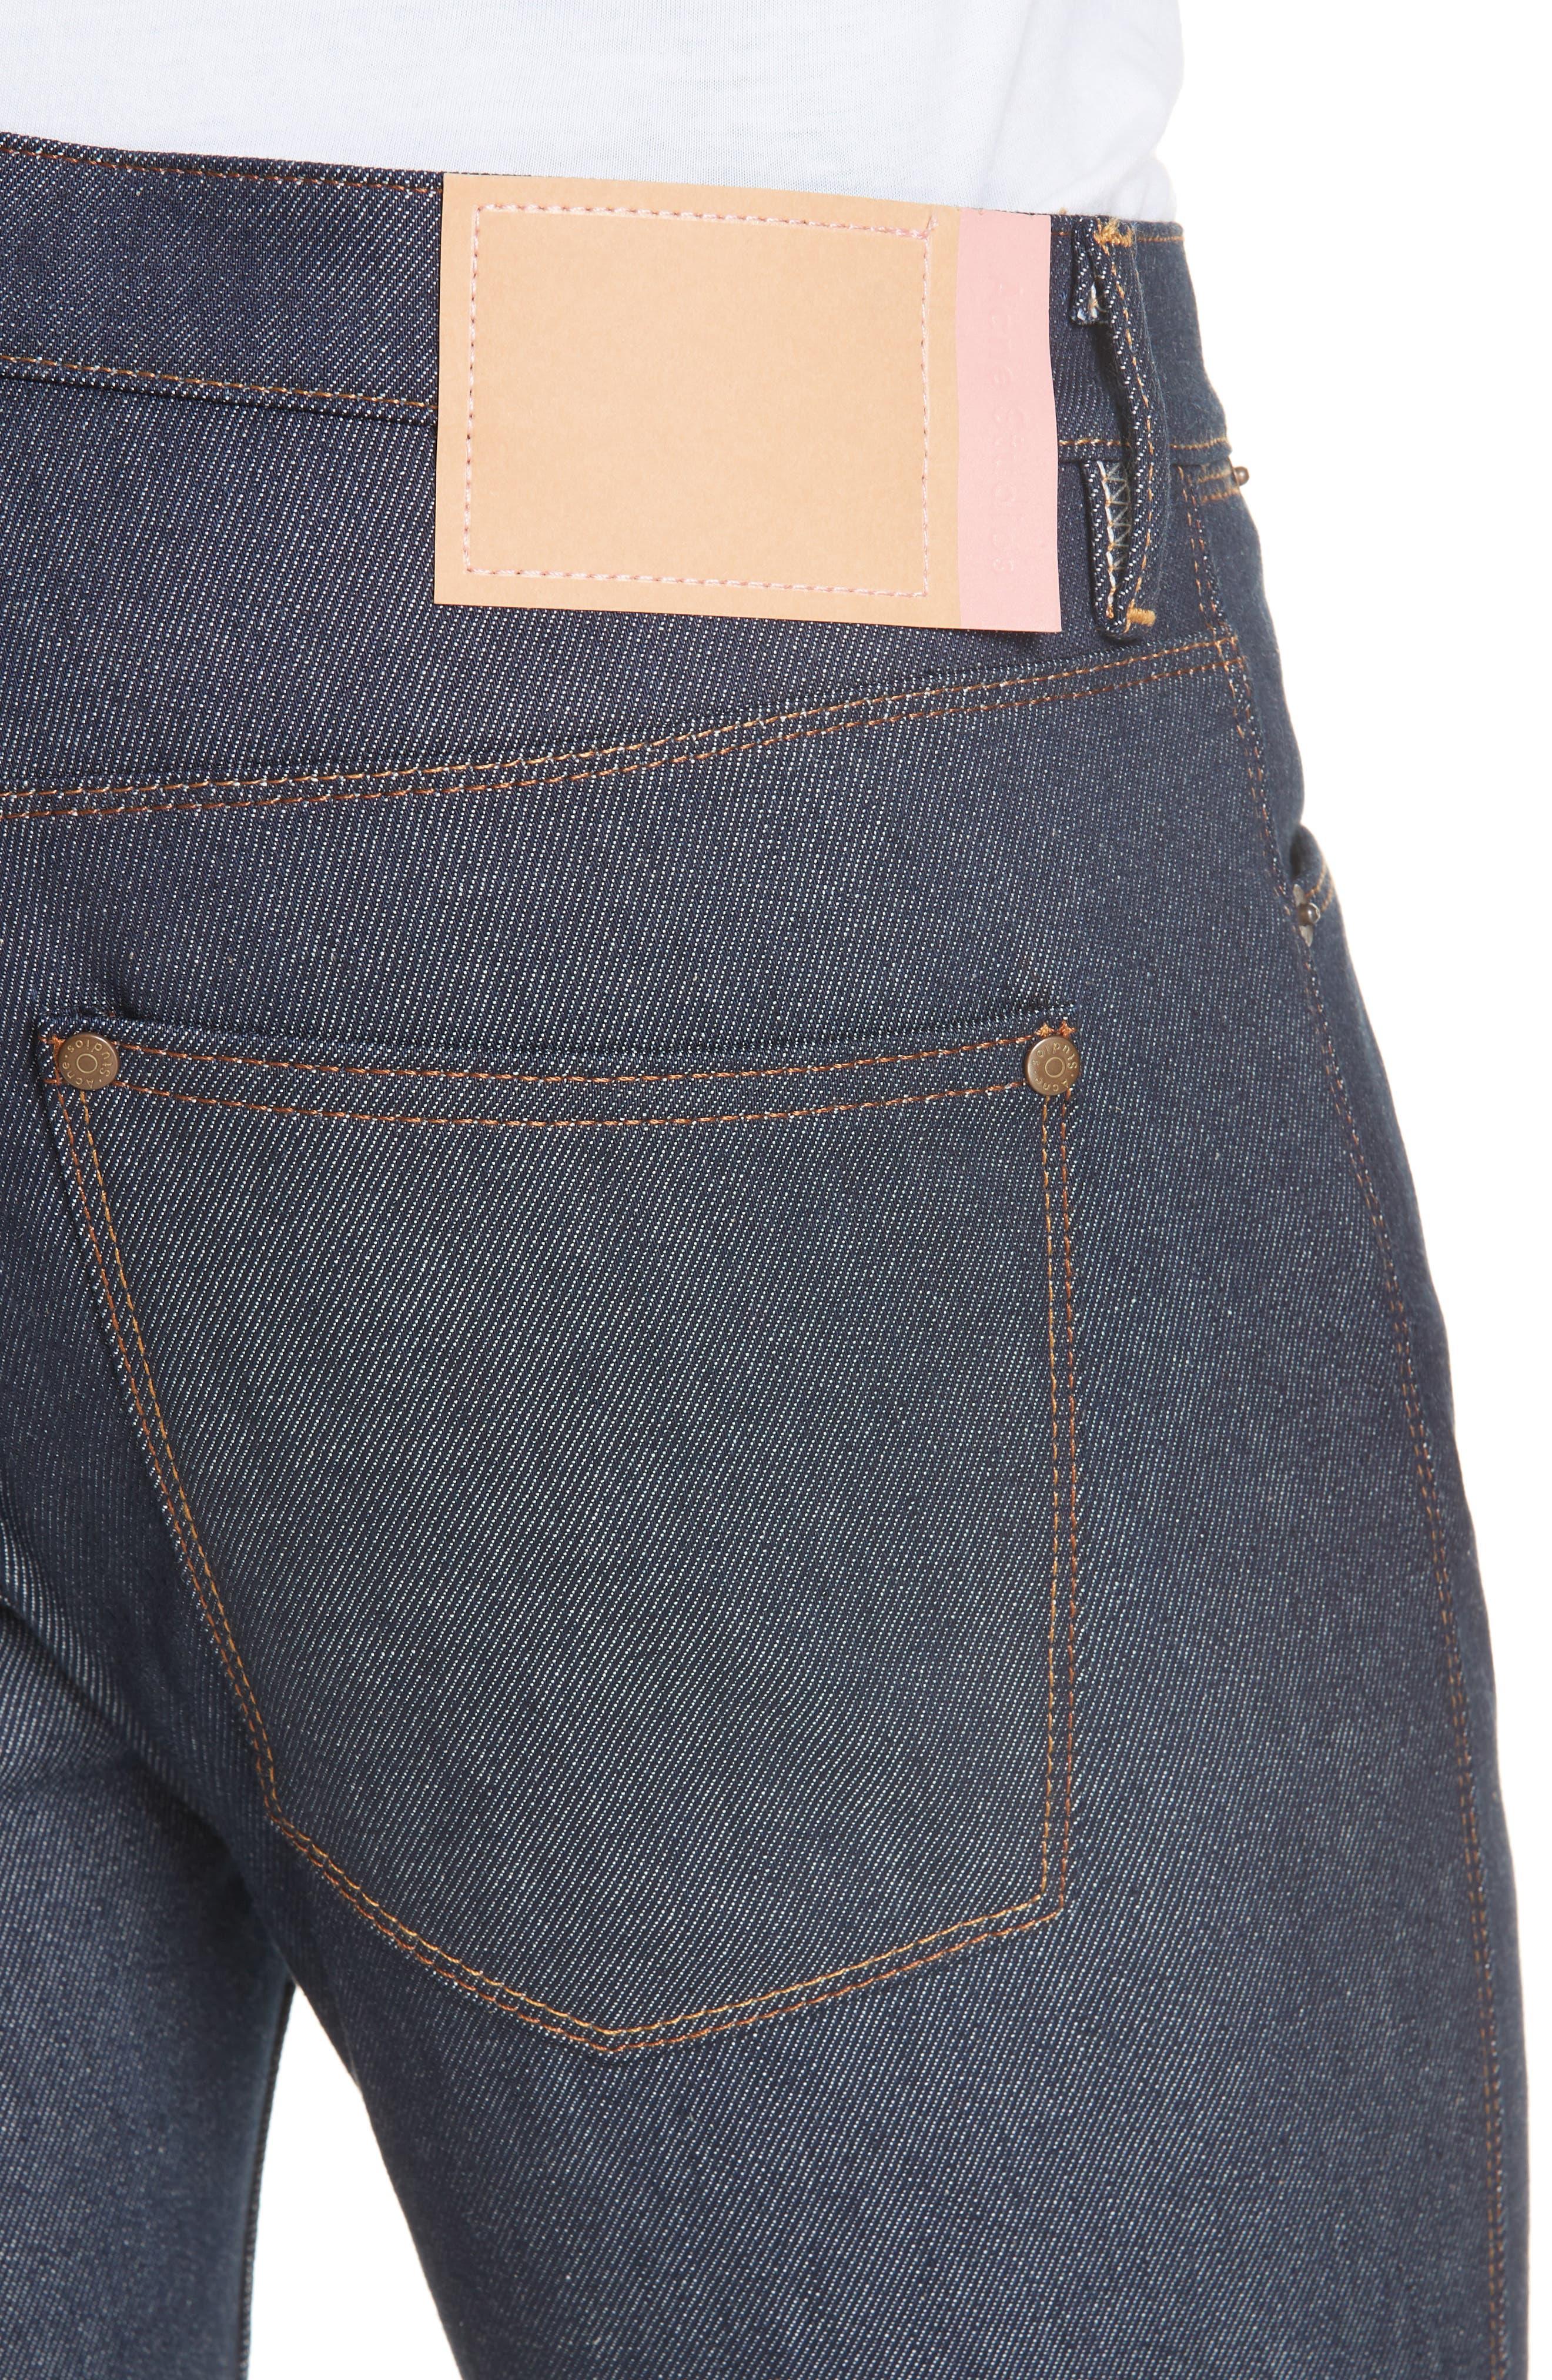 Max Slim Straight Leg Jeans,                             Alternate thumbnail 4, color,                             MAX INDIGO